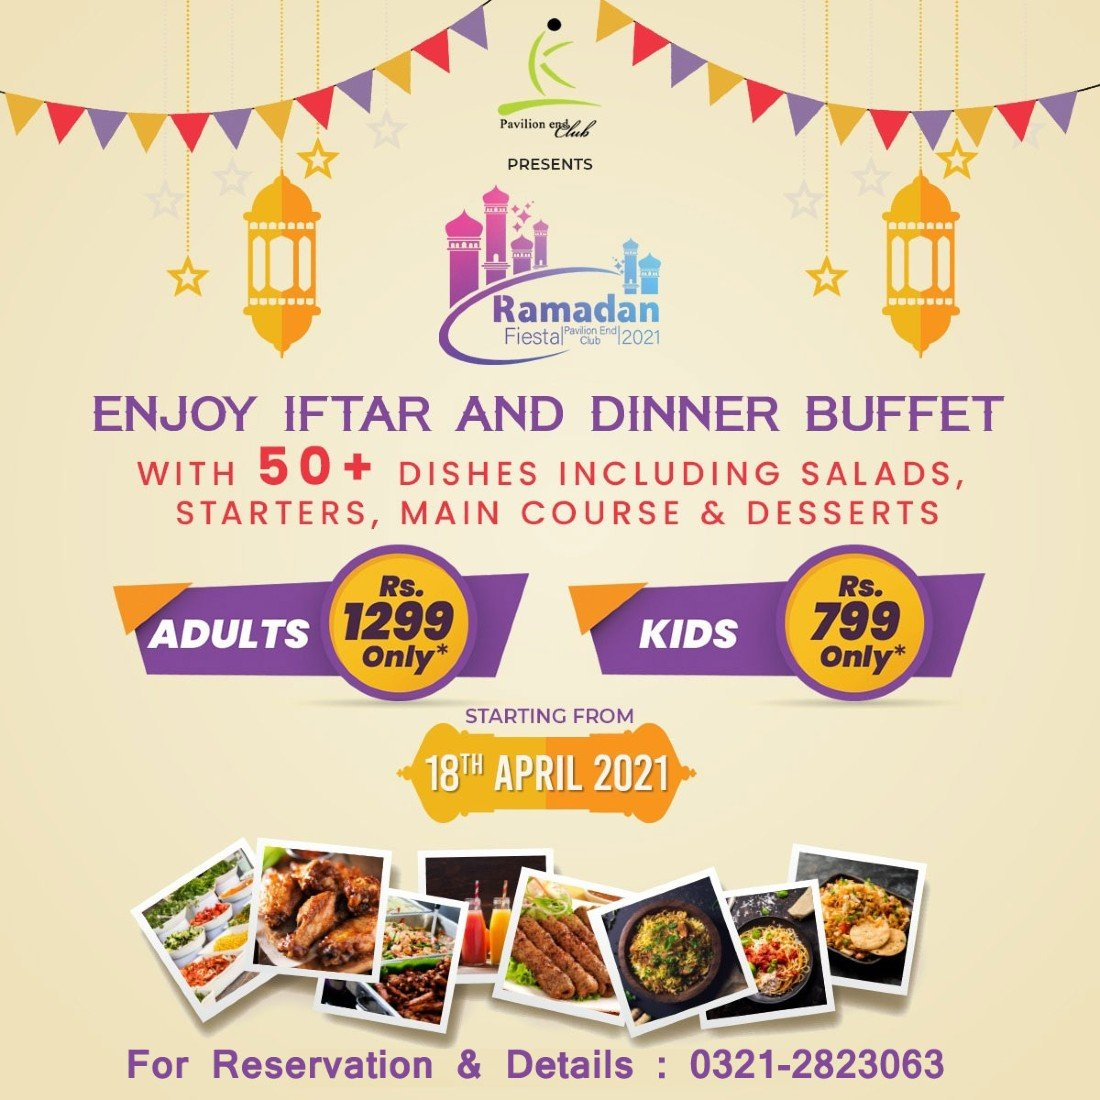 Ramazan Fiesta 2021 @ Pavilion End Club  | Event in Karachi | AllEvents.in